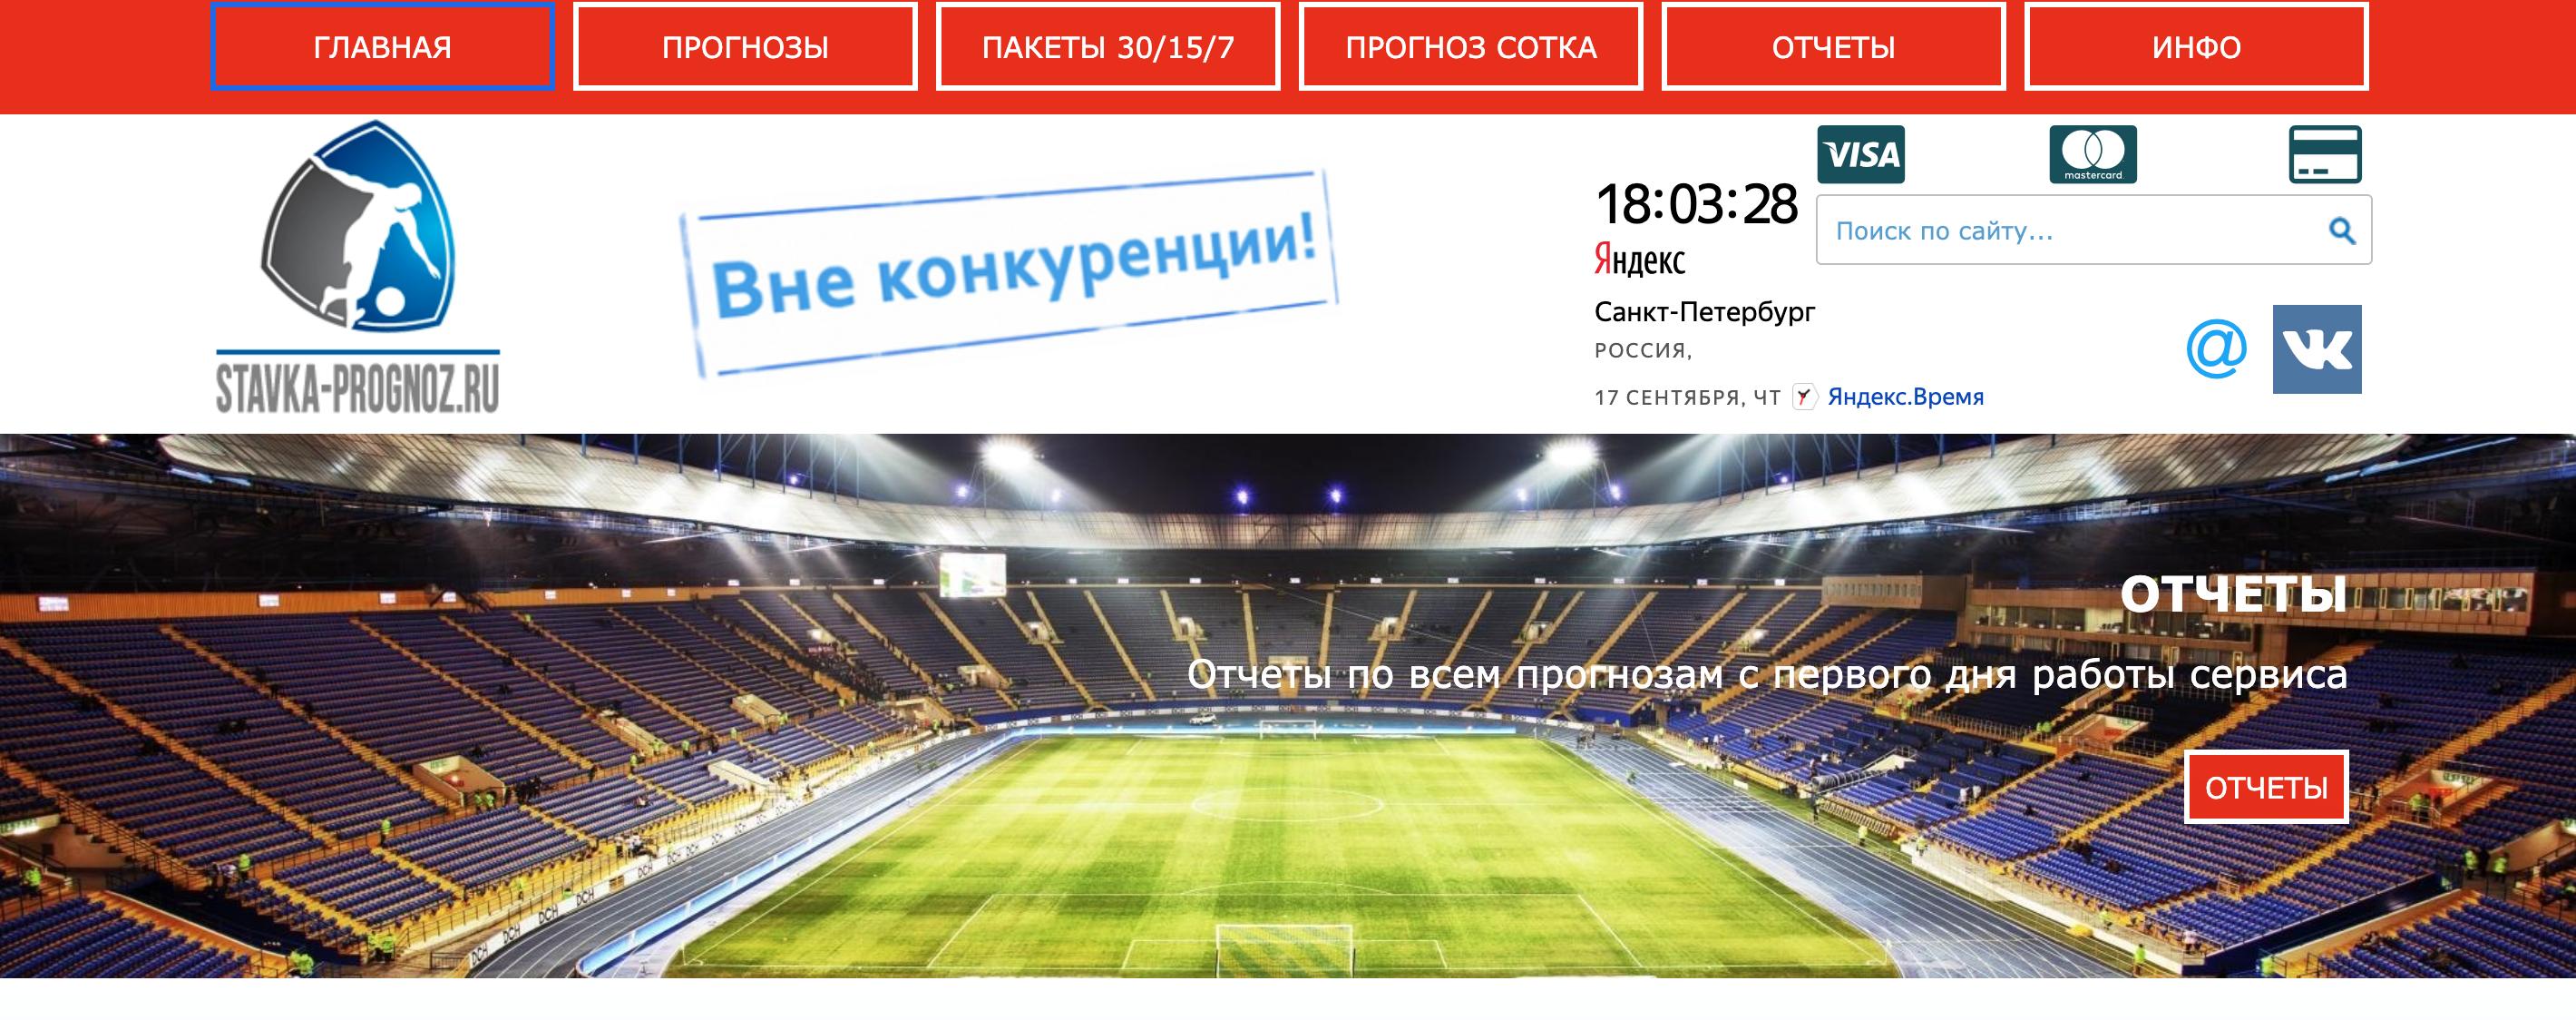 Главная страница сайта stavka-prognoz.ru